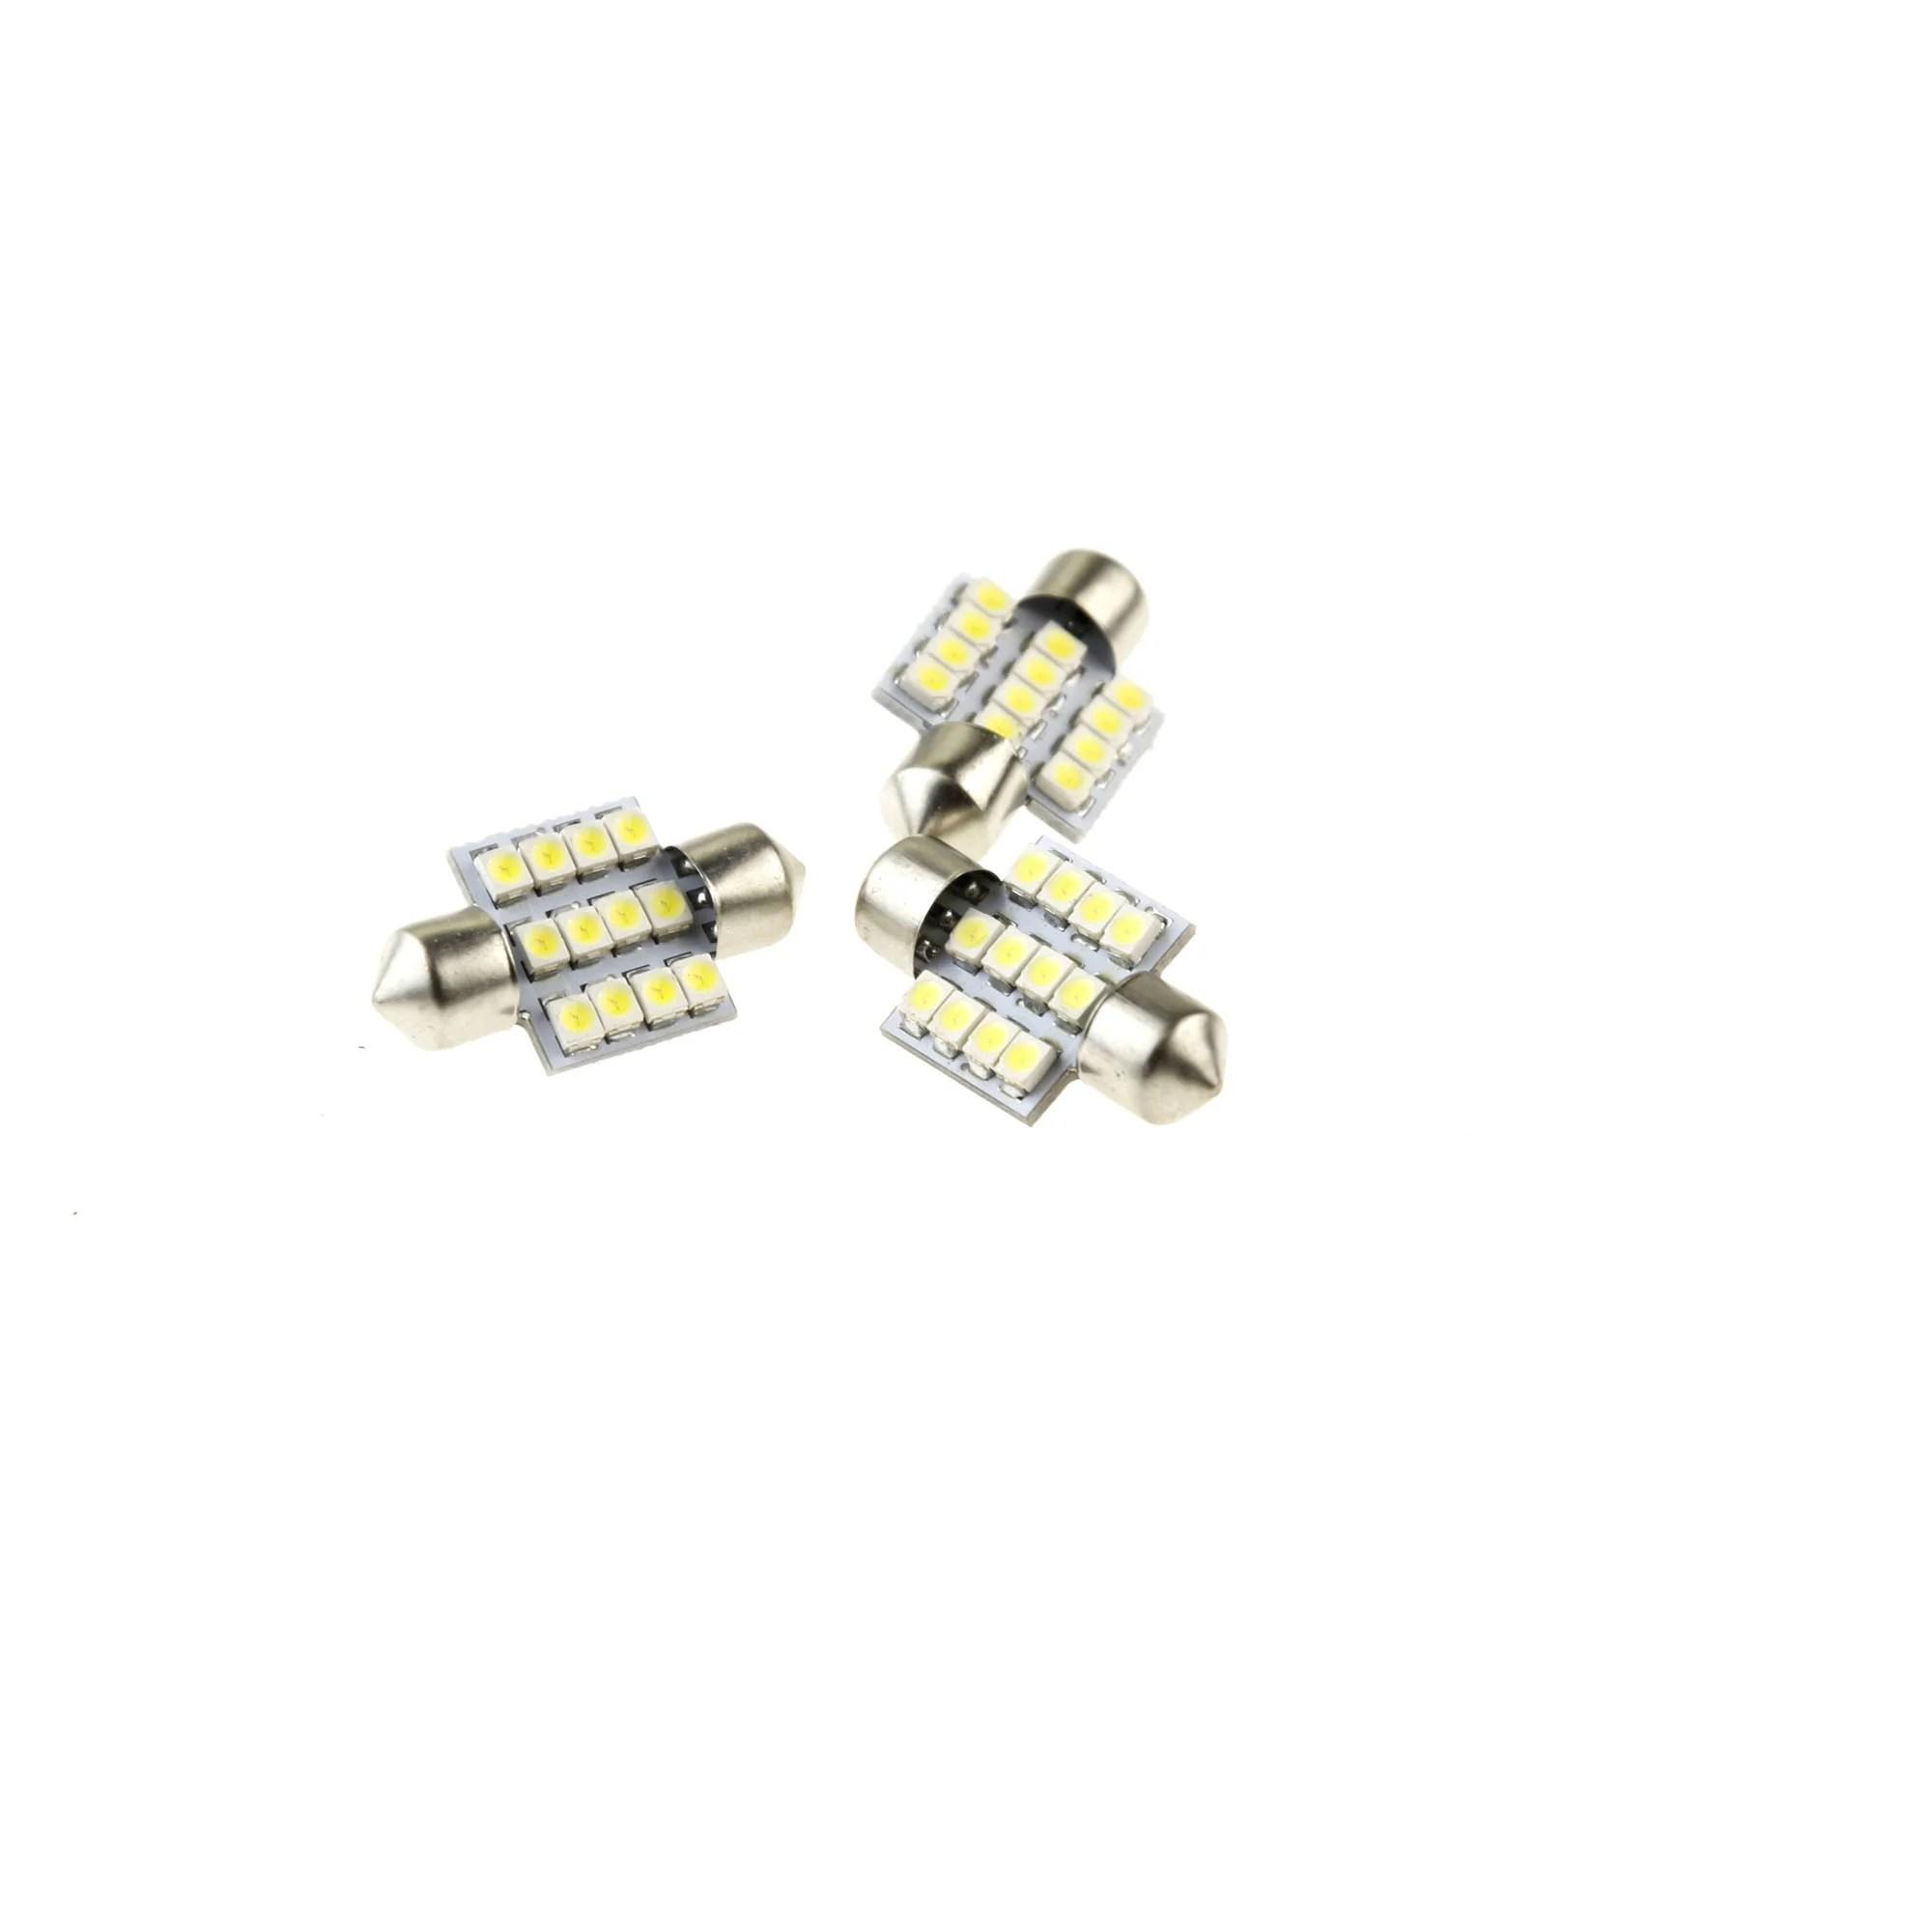 medium resolution of interior lighting subaru wrx led lights fastwrx com subaru wrx shifter subaru wrx interior illumination wiring